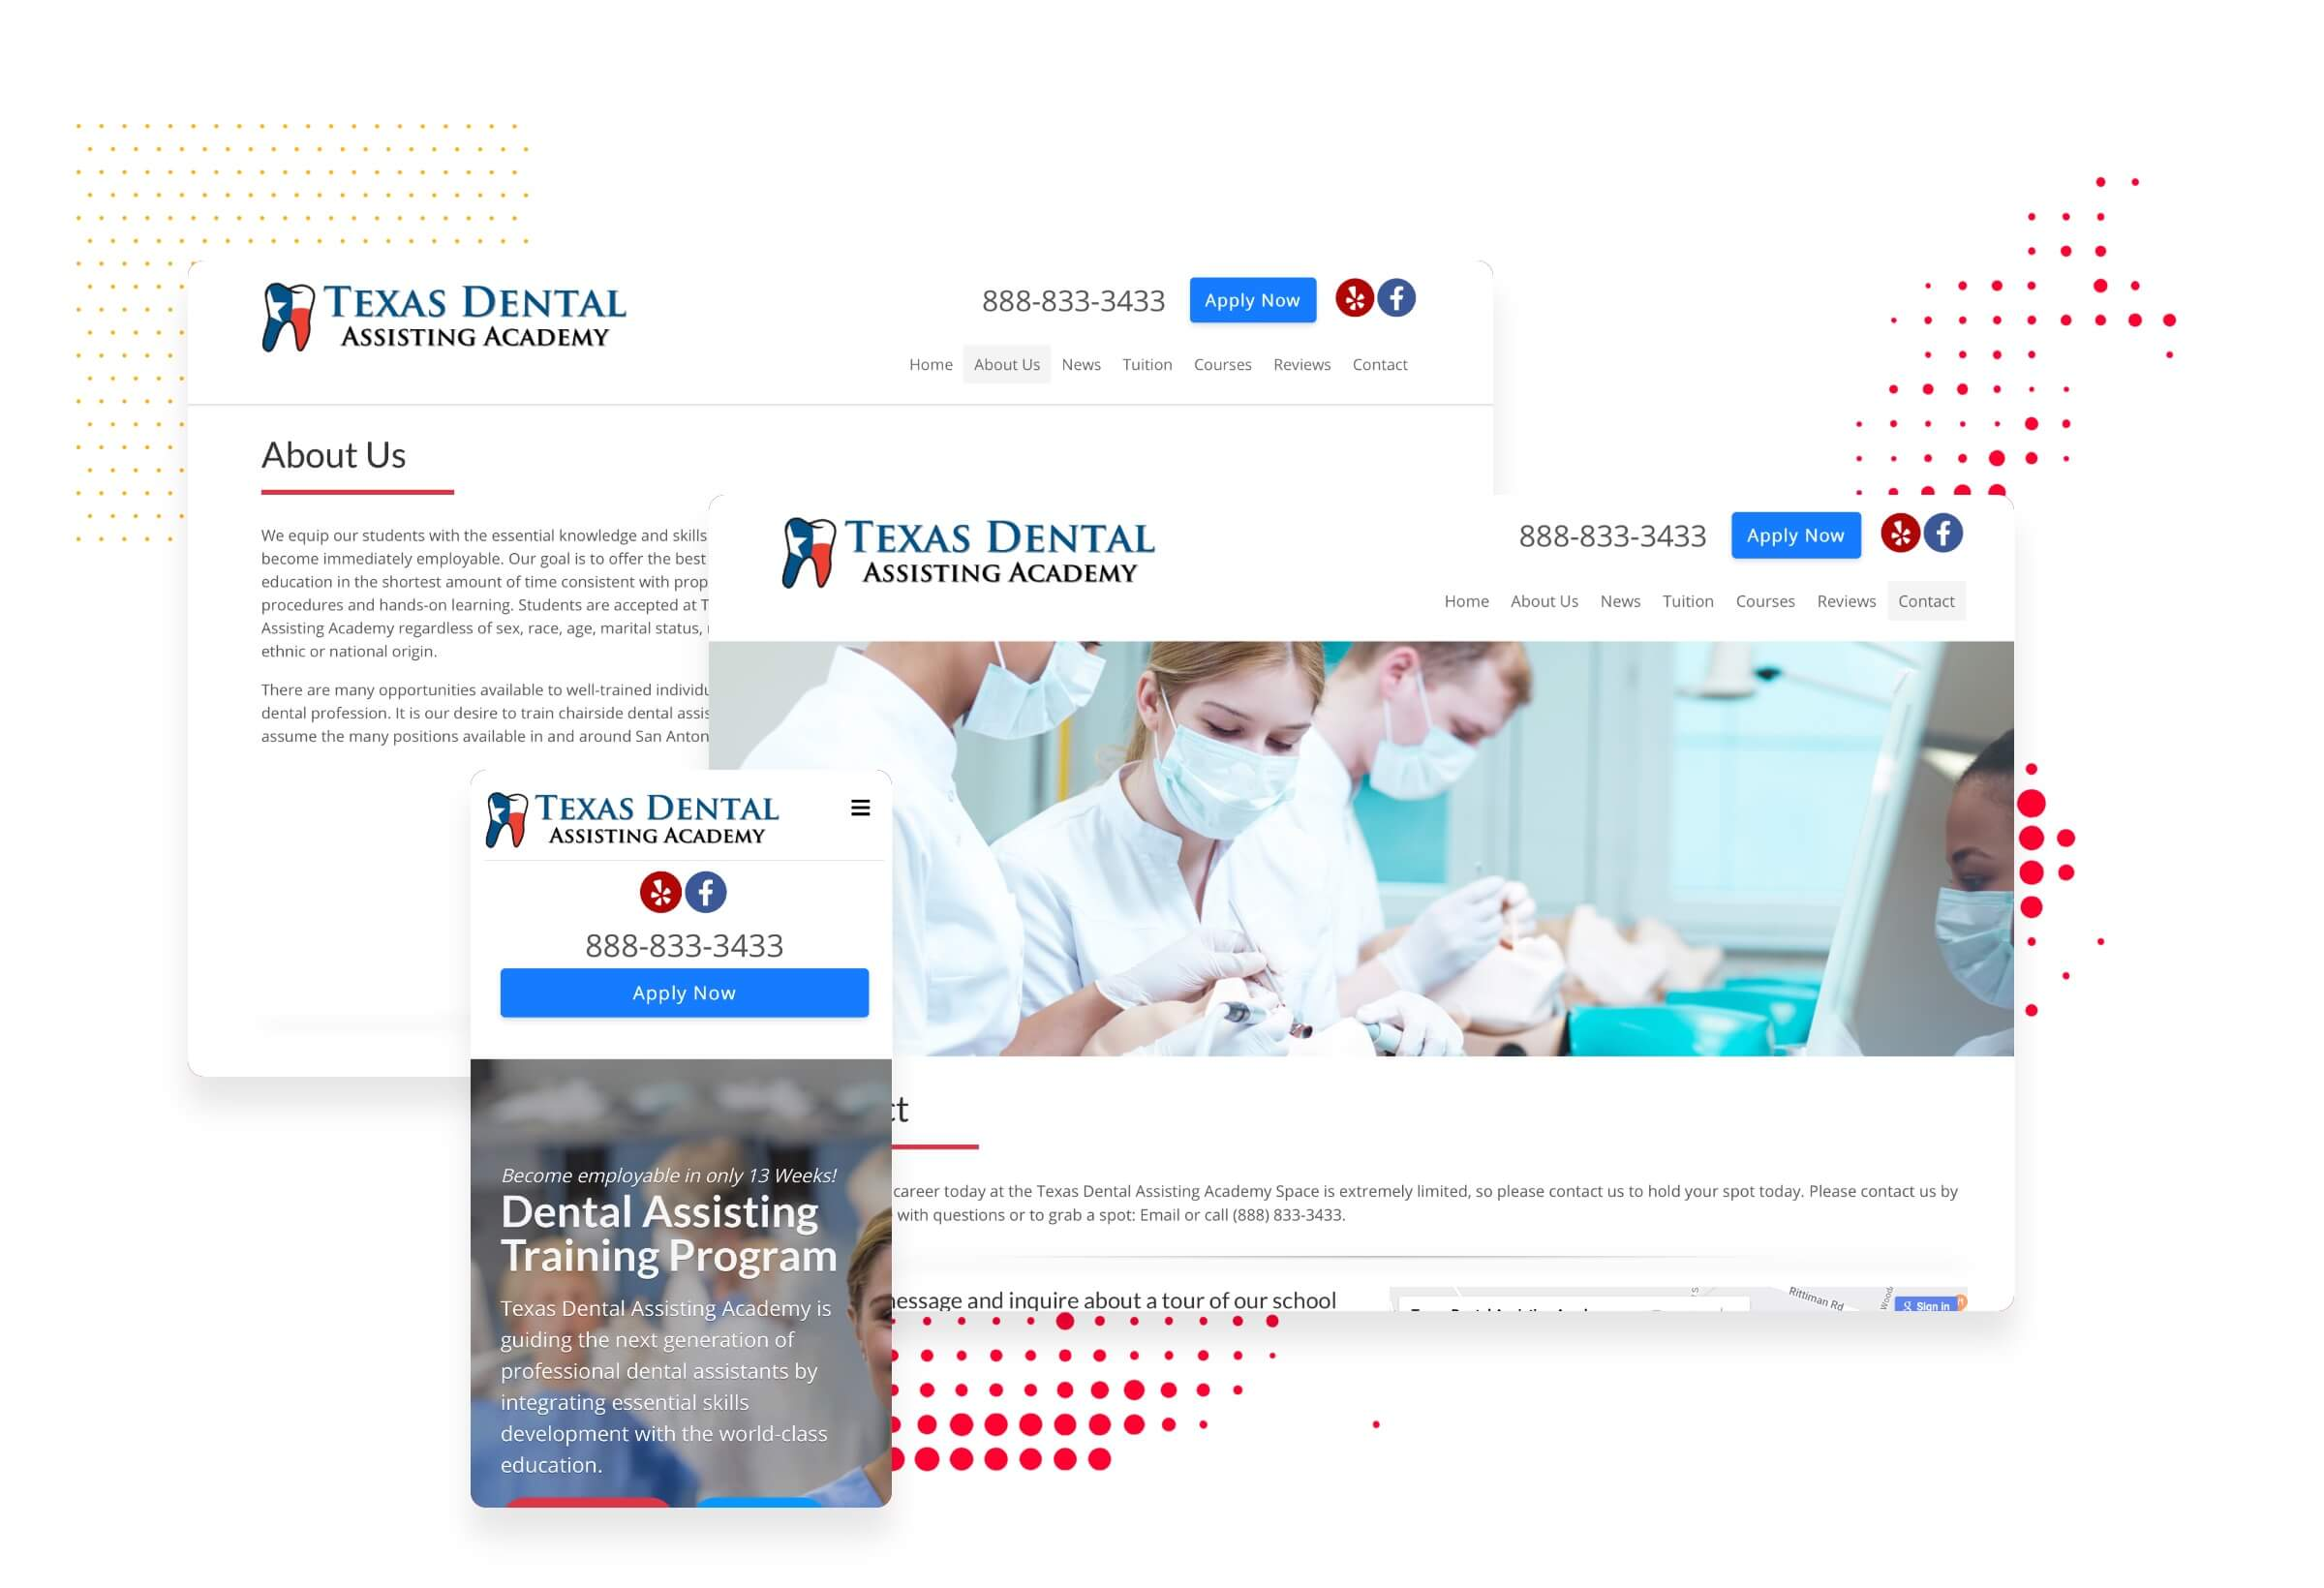 Texas Dental Assisting Academy